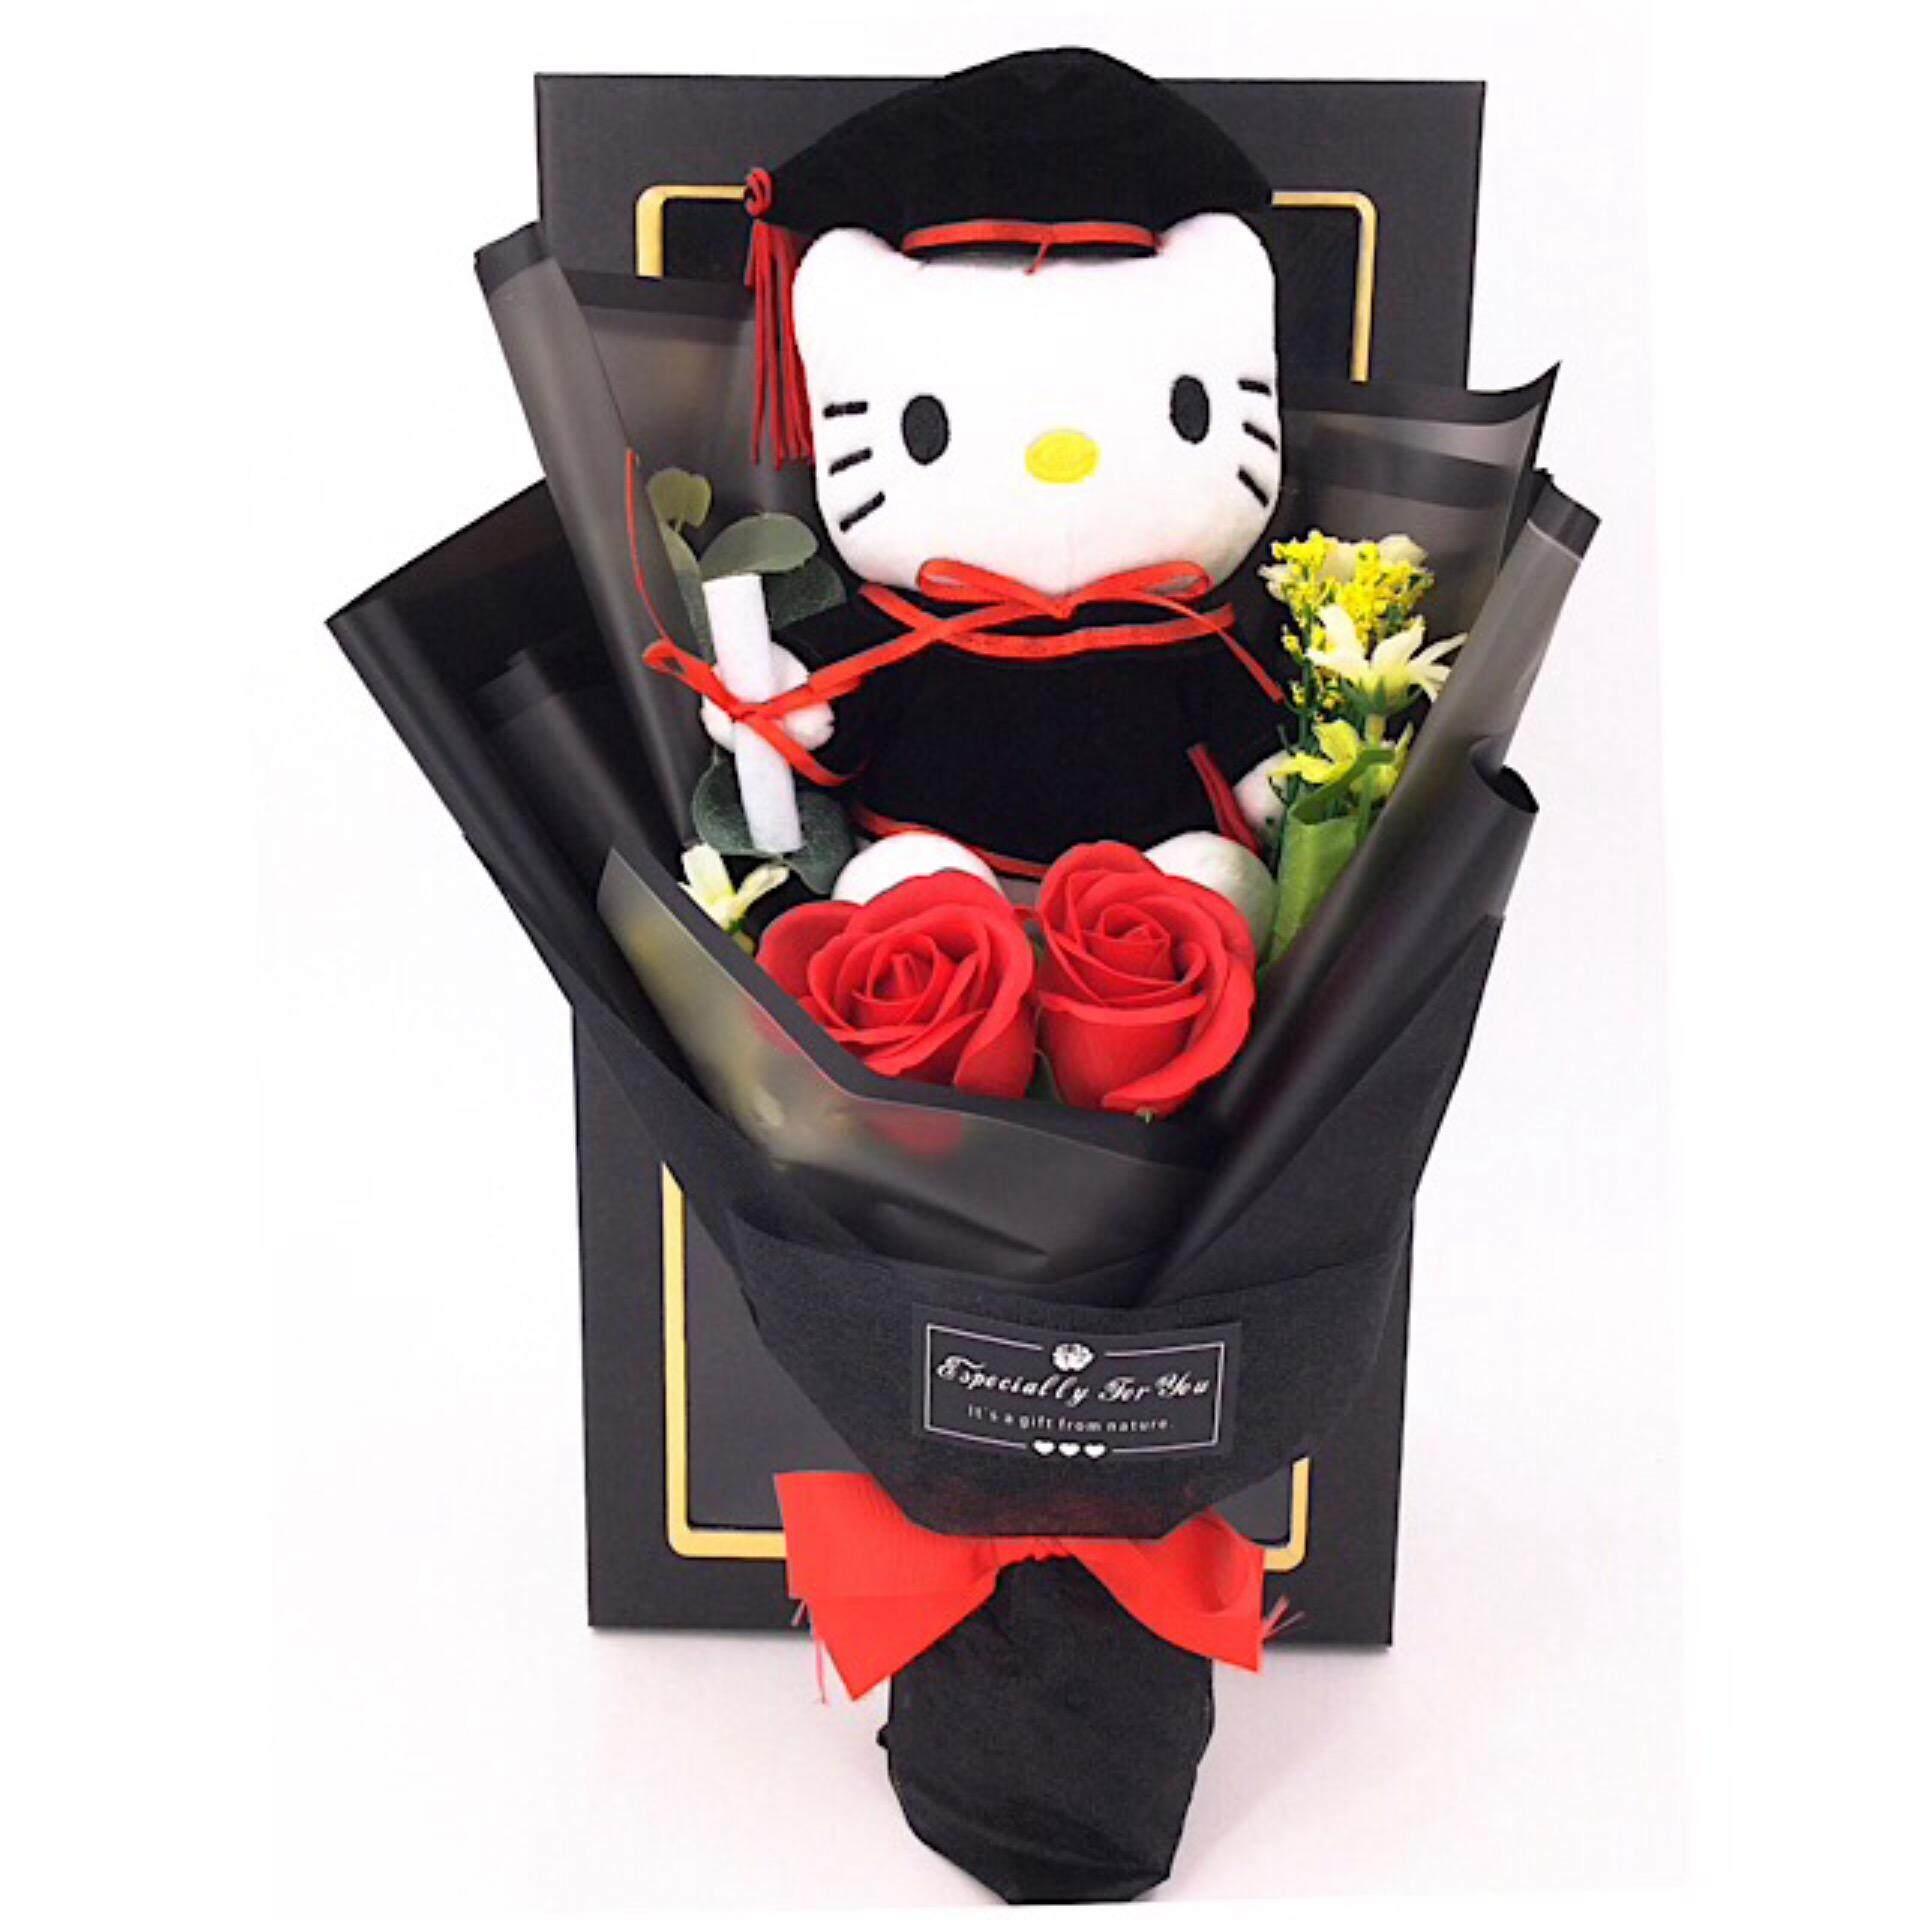 flower bouquet - Buy flower bouquet at Best Price in Malaysia   www ...